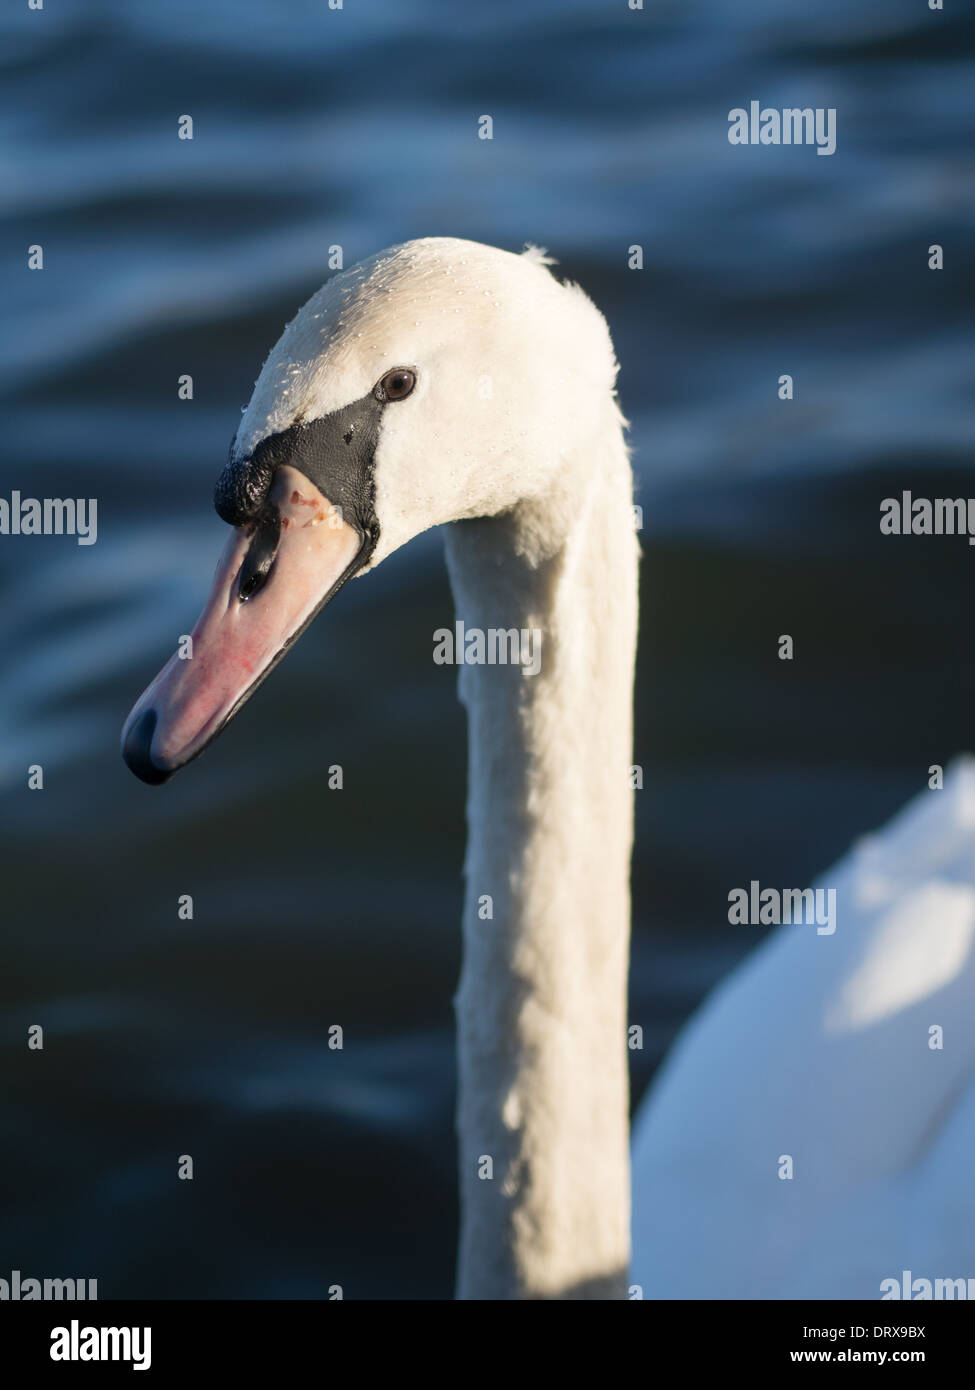 Swan by Lake - Stock Image